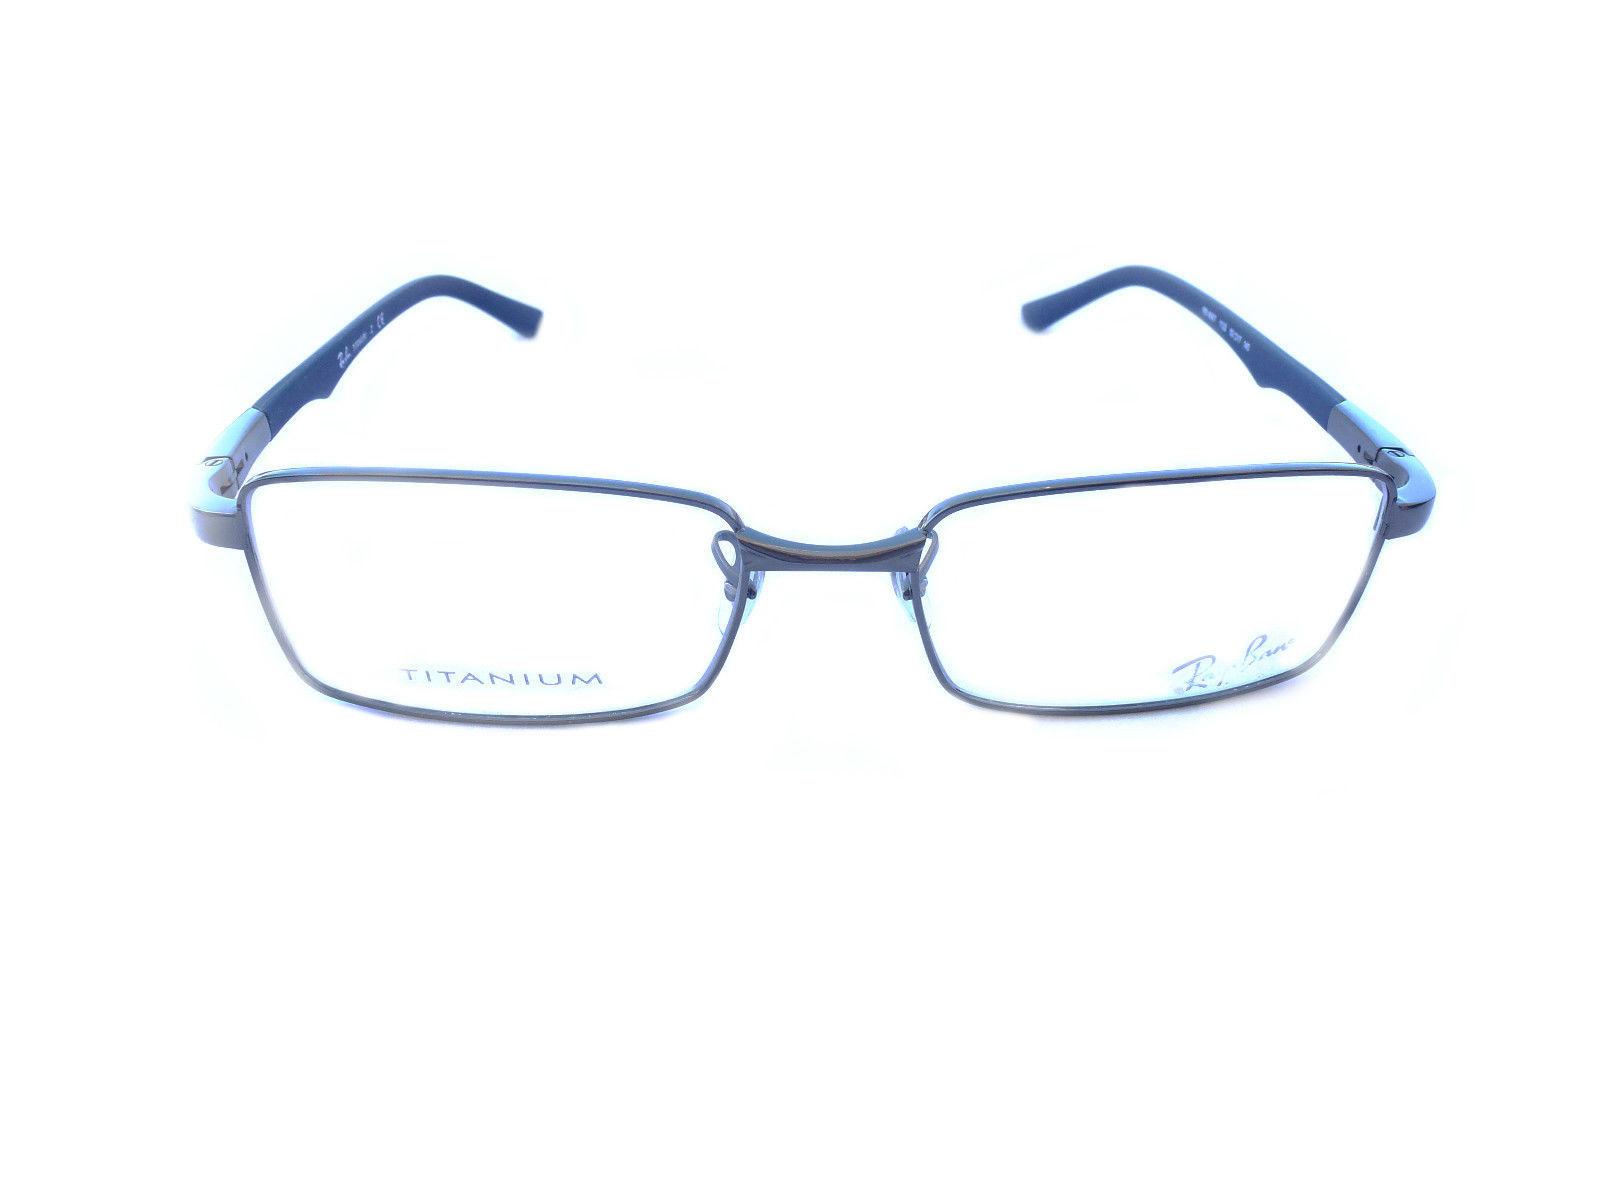 Ray Ban Titanium Glasses Frames : Ray-ban eyeglasses frame Model RB8667 Gunmetal 100% ...